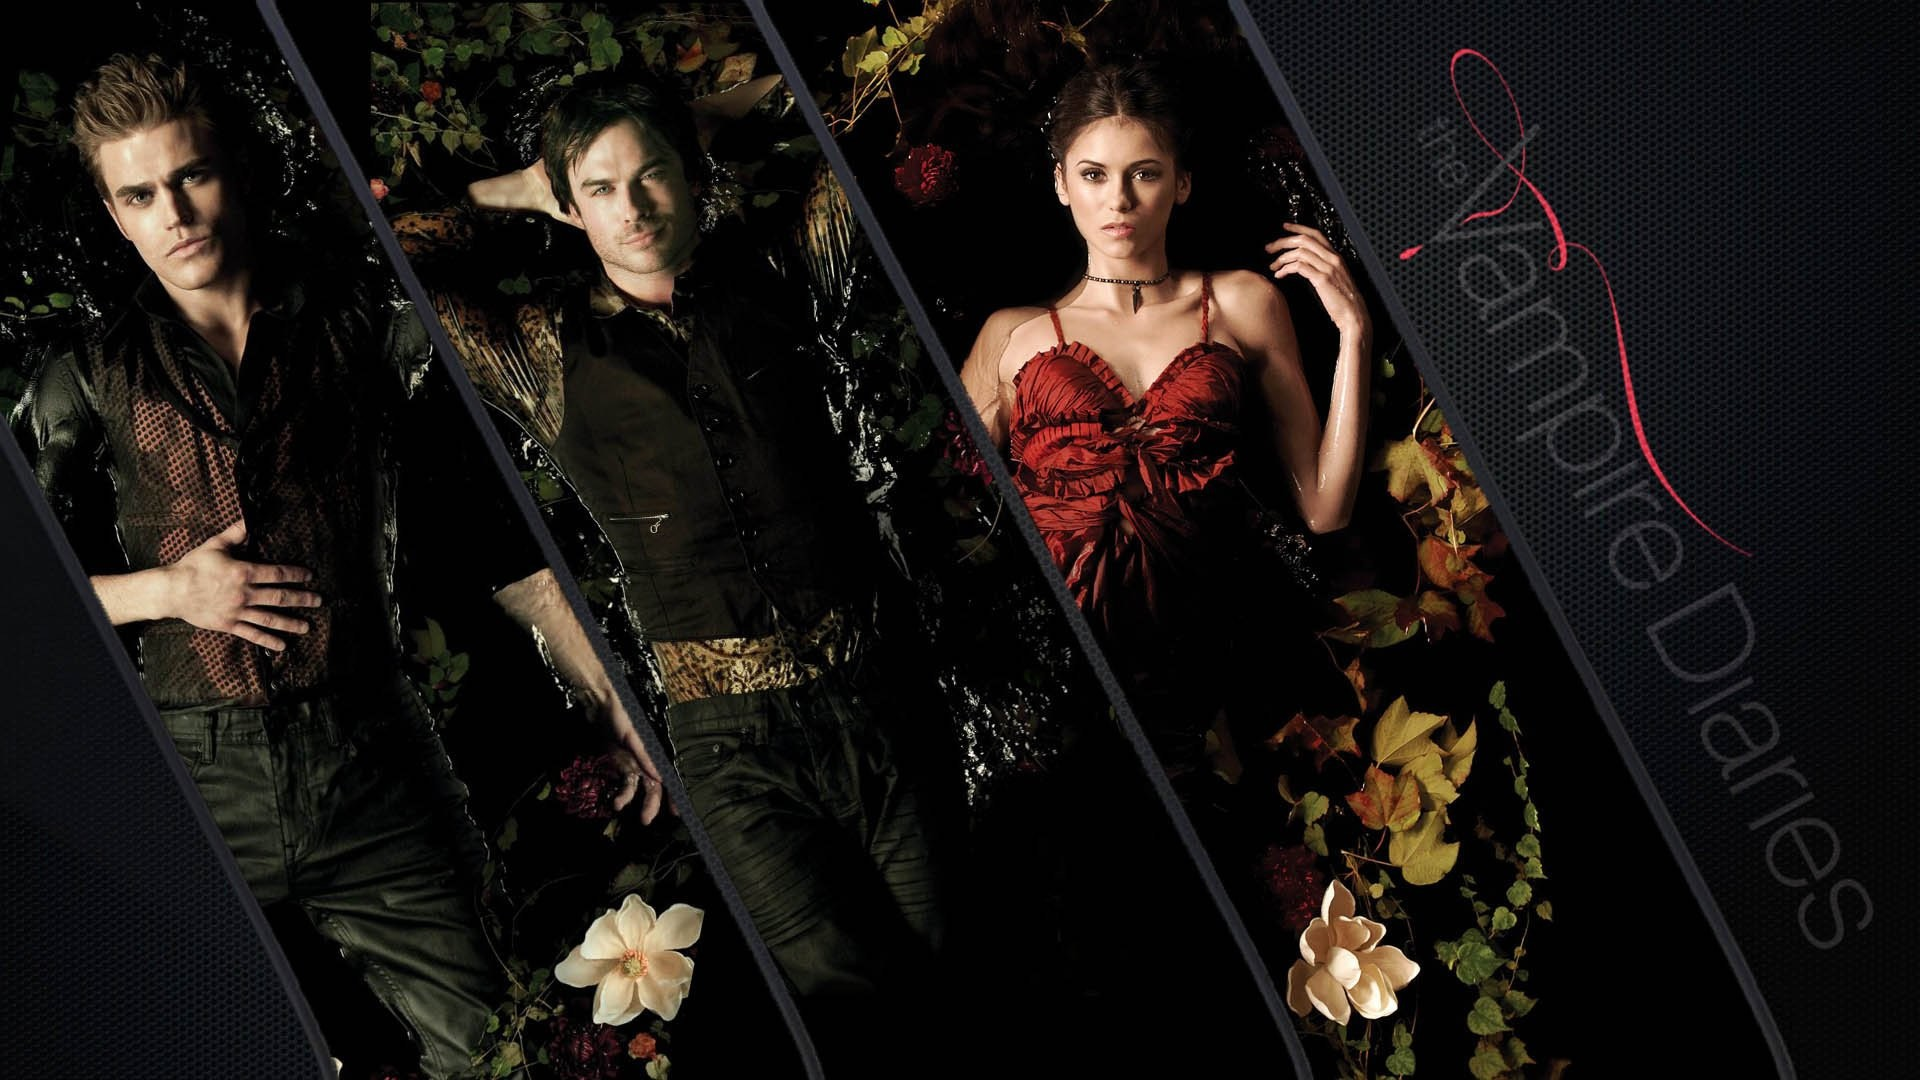 Vampire Diaries Wallpapers (77+ images)